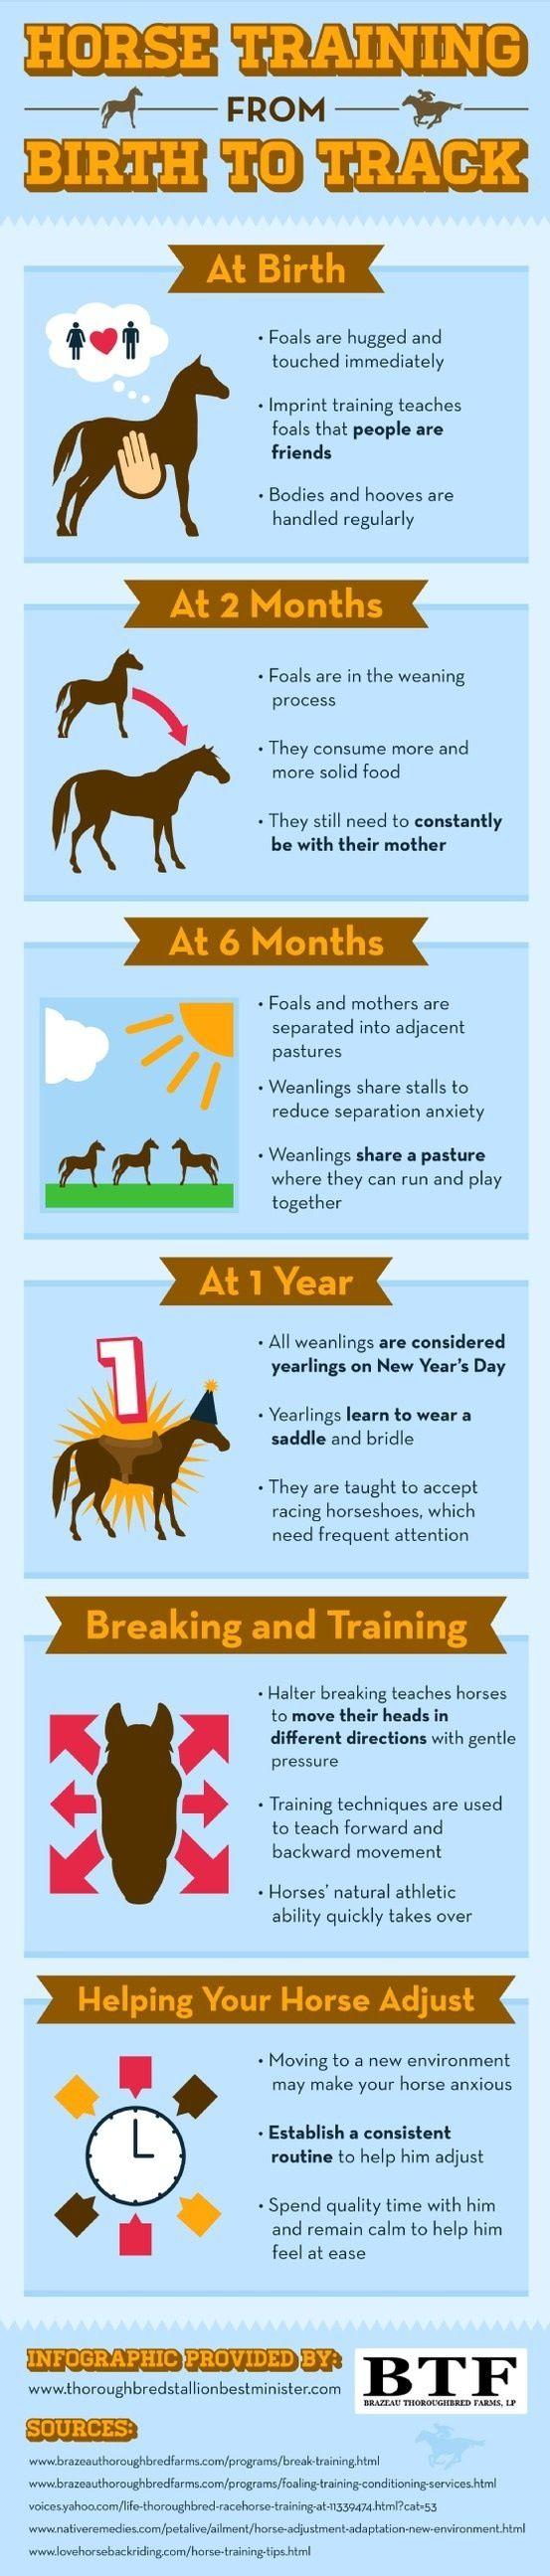 Horse info